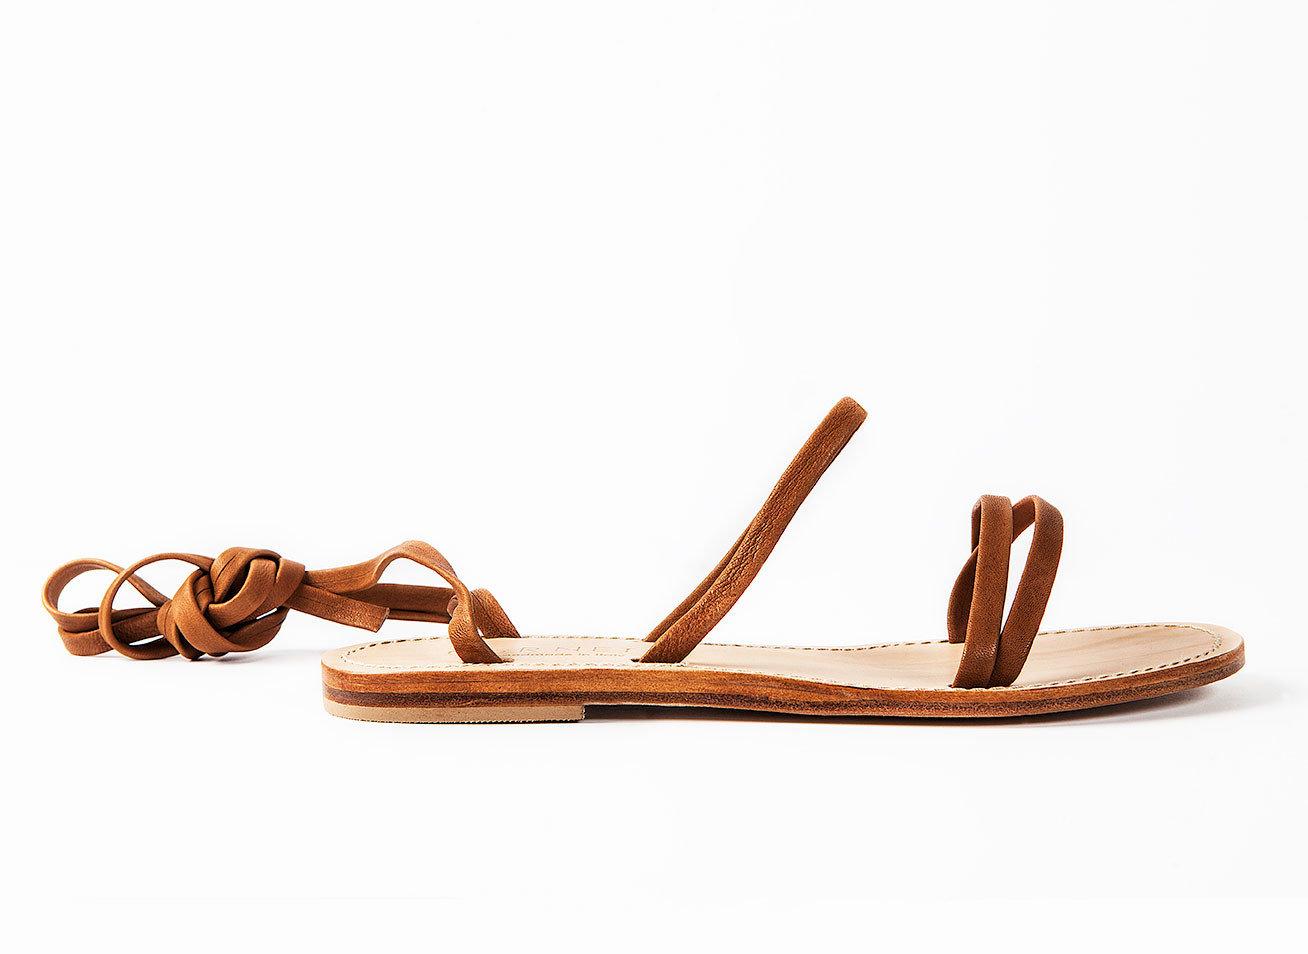 Cruise Travel Style + Design footwear shoe product sandal leather outdoor shoe flip flops